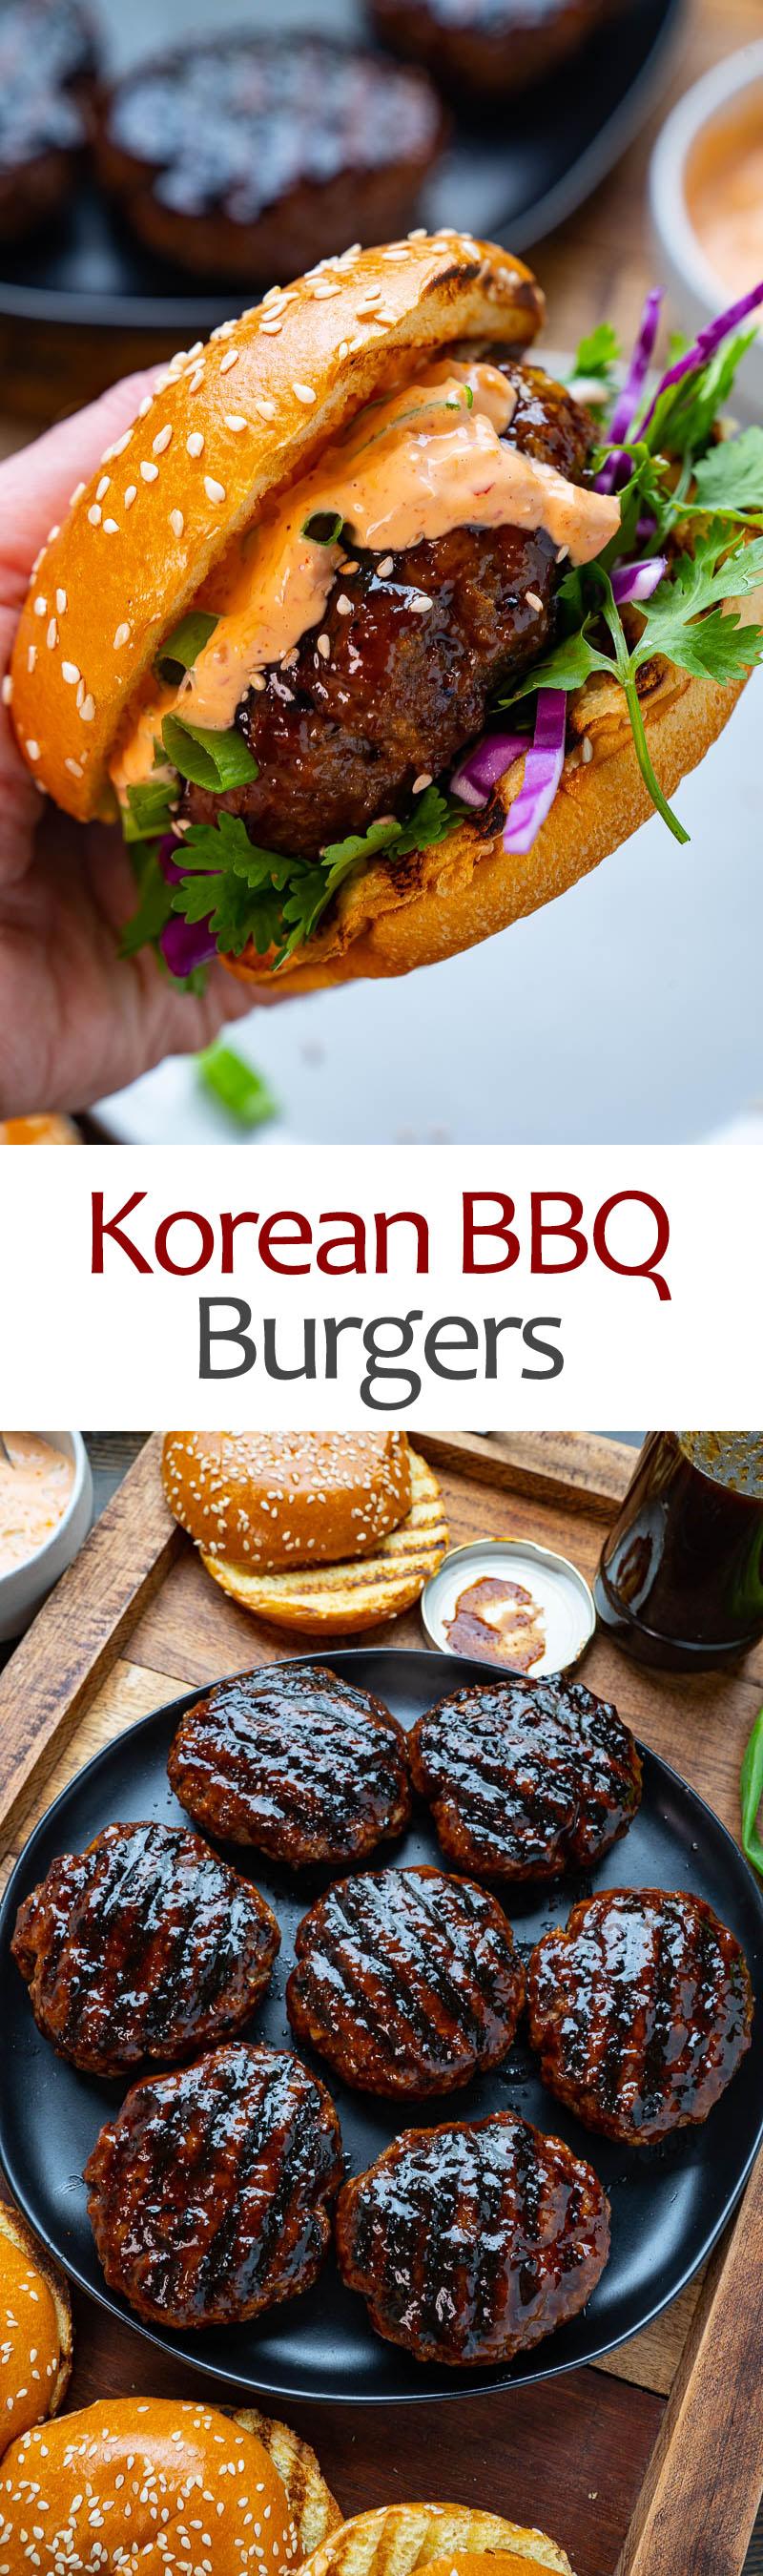 Korean BBQ Burgers